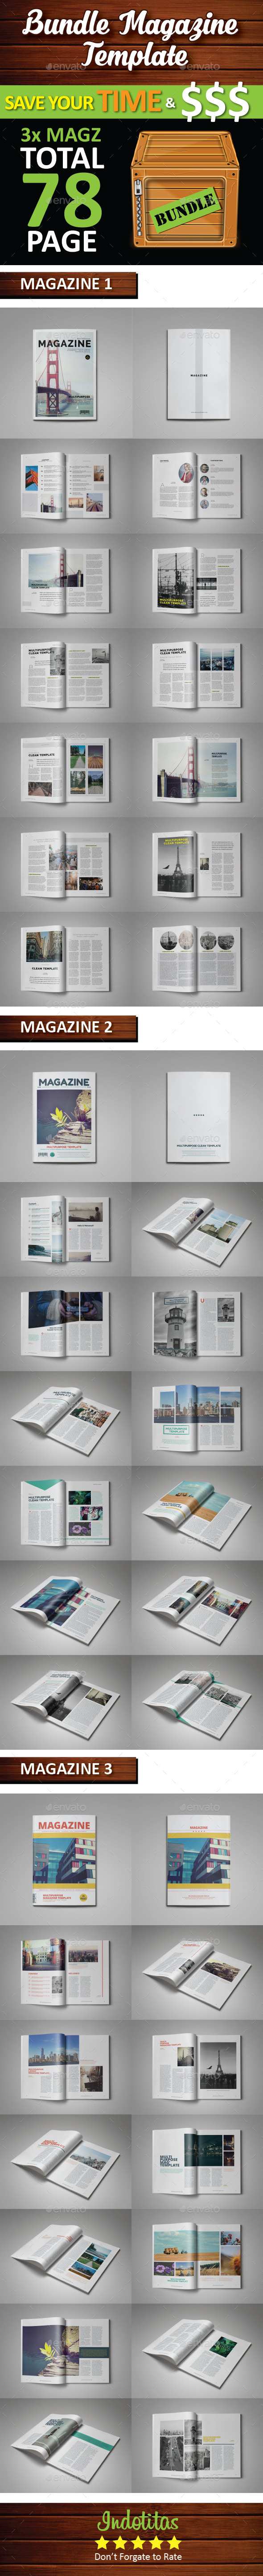 GraphicRiver Bundle Magazine Template 10063200